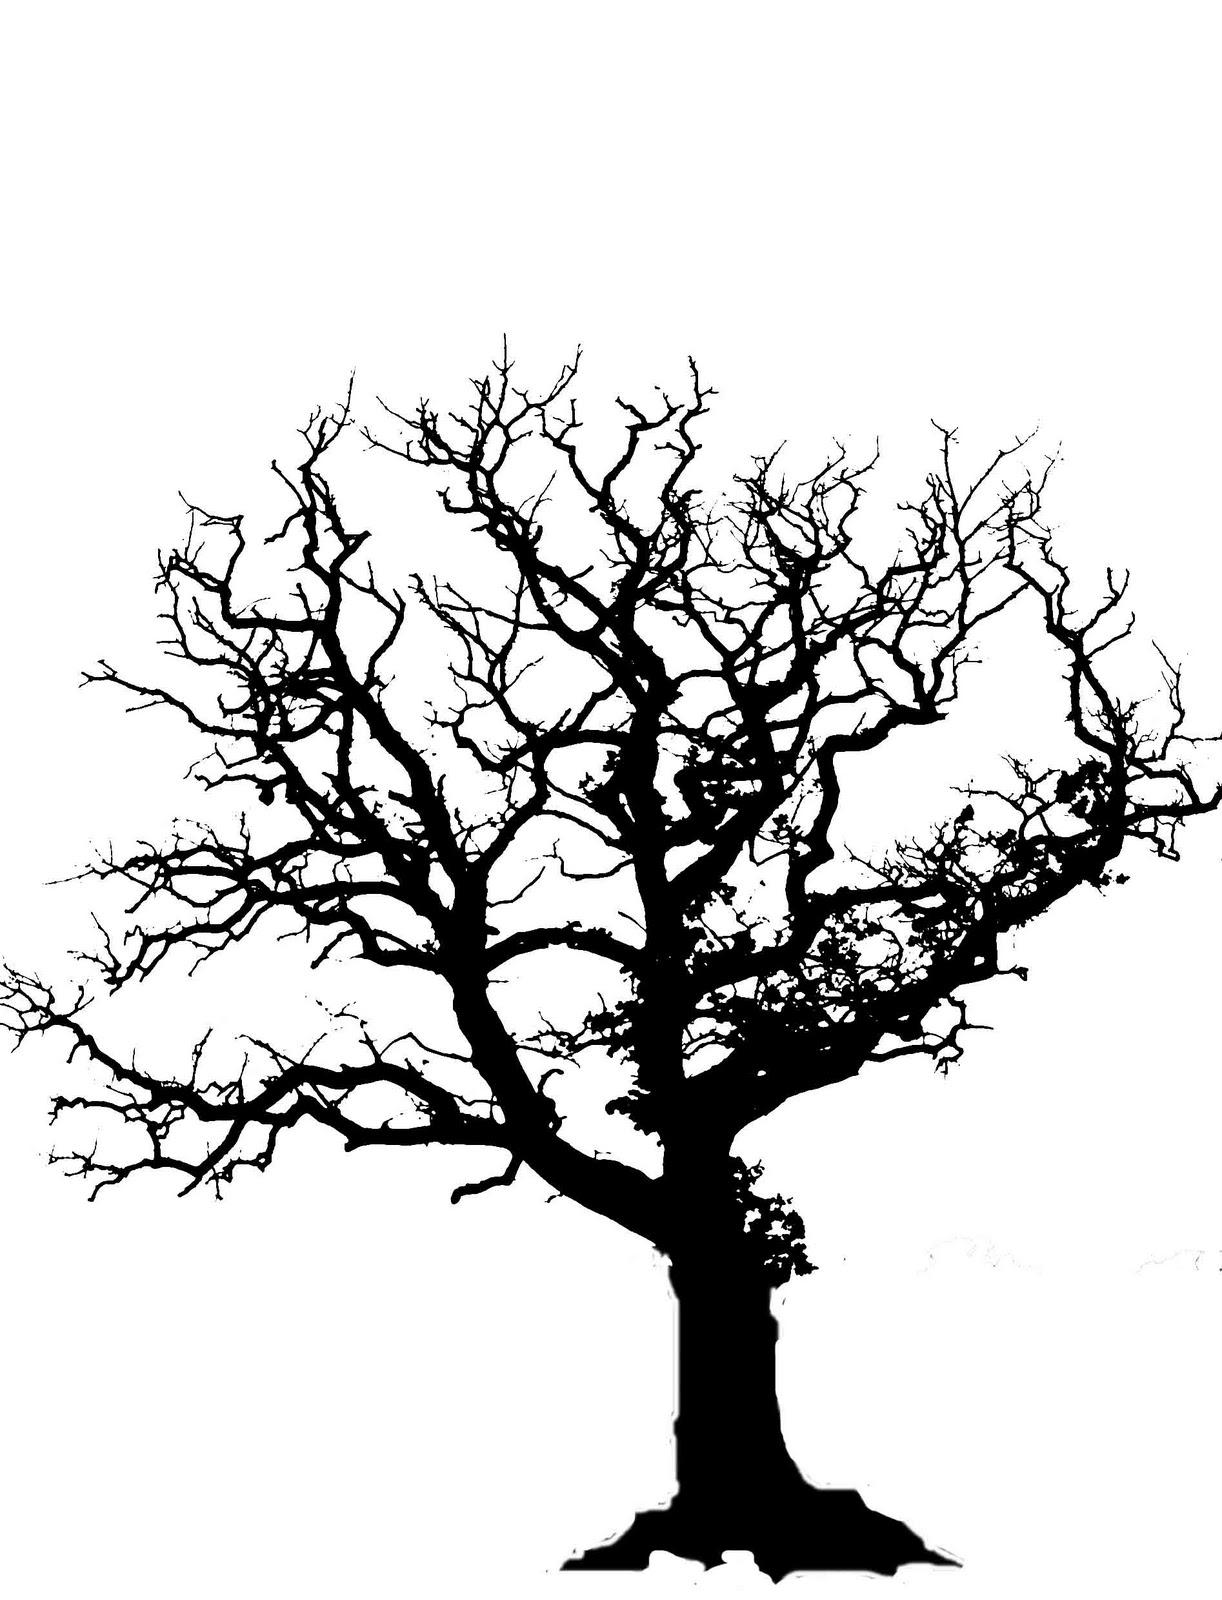 Dead Tree Silhouette Clipart.